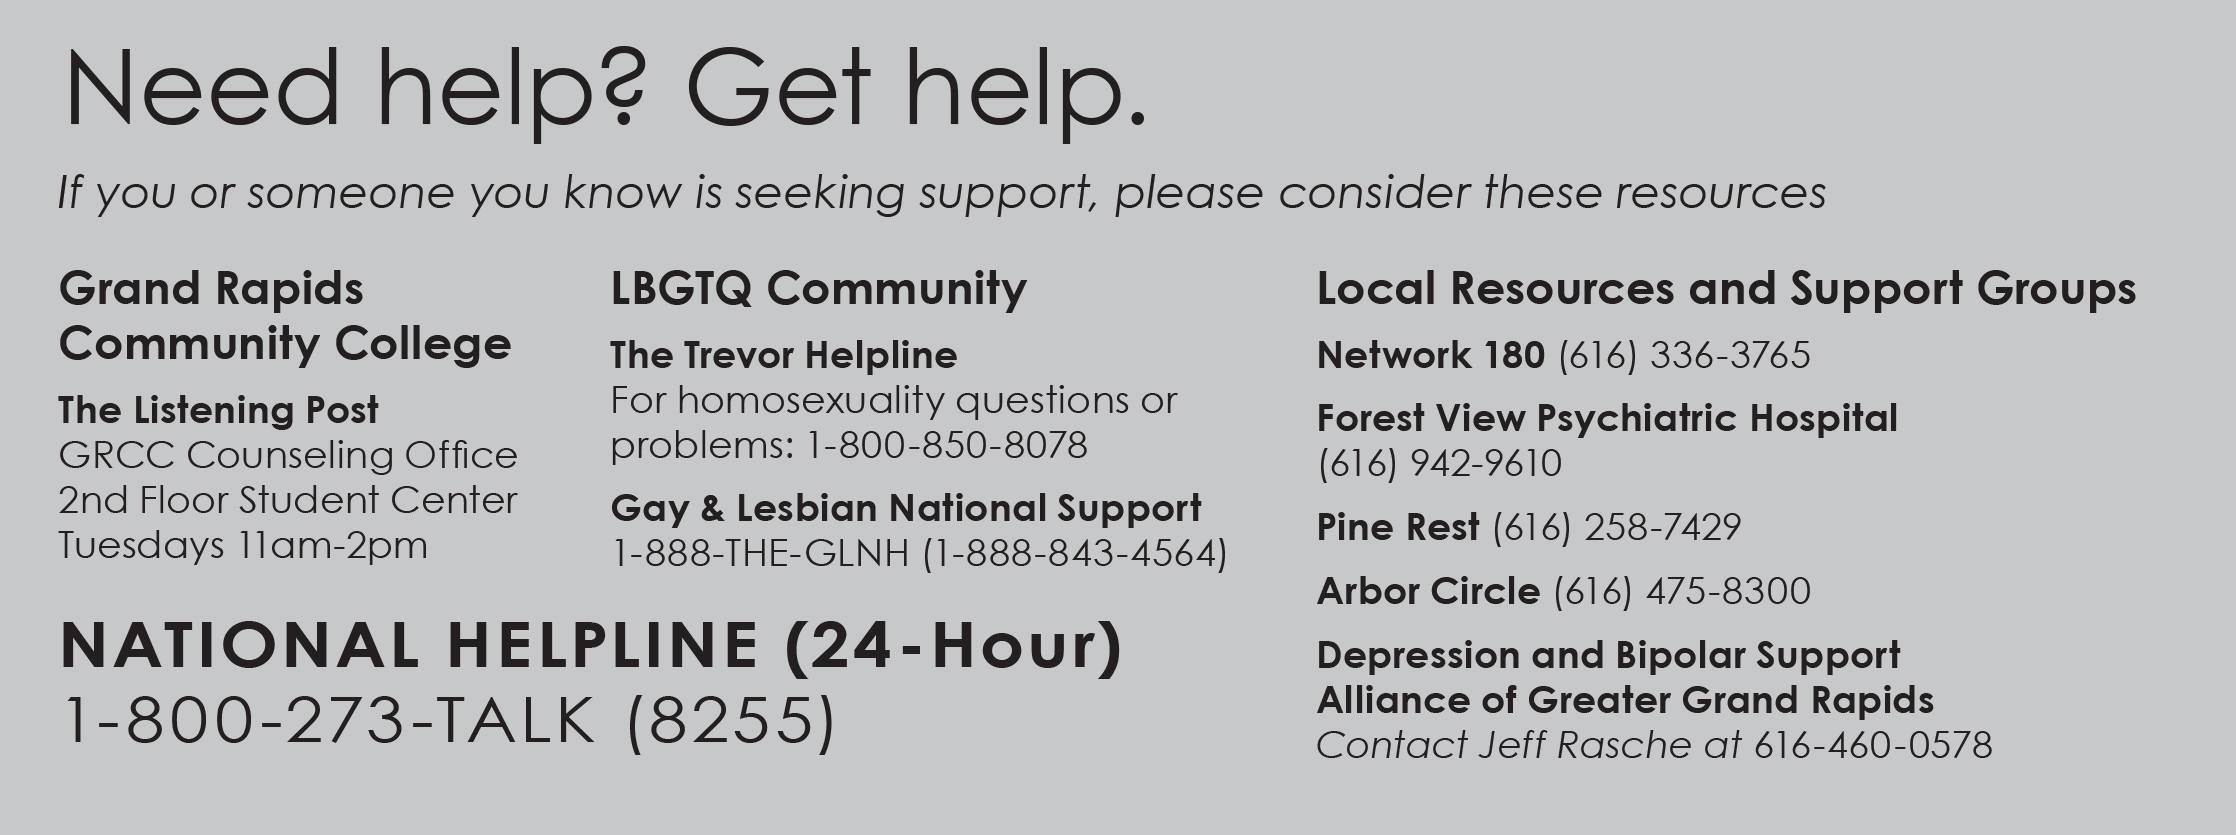 depression hotlines